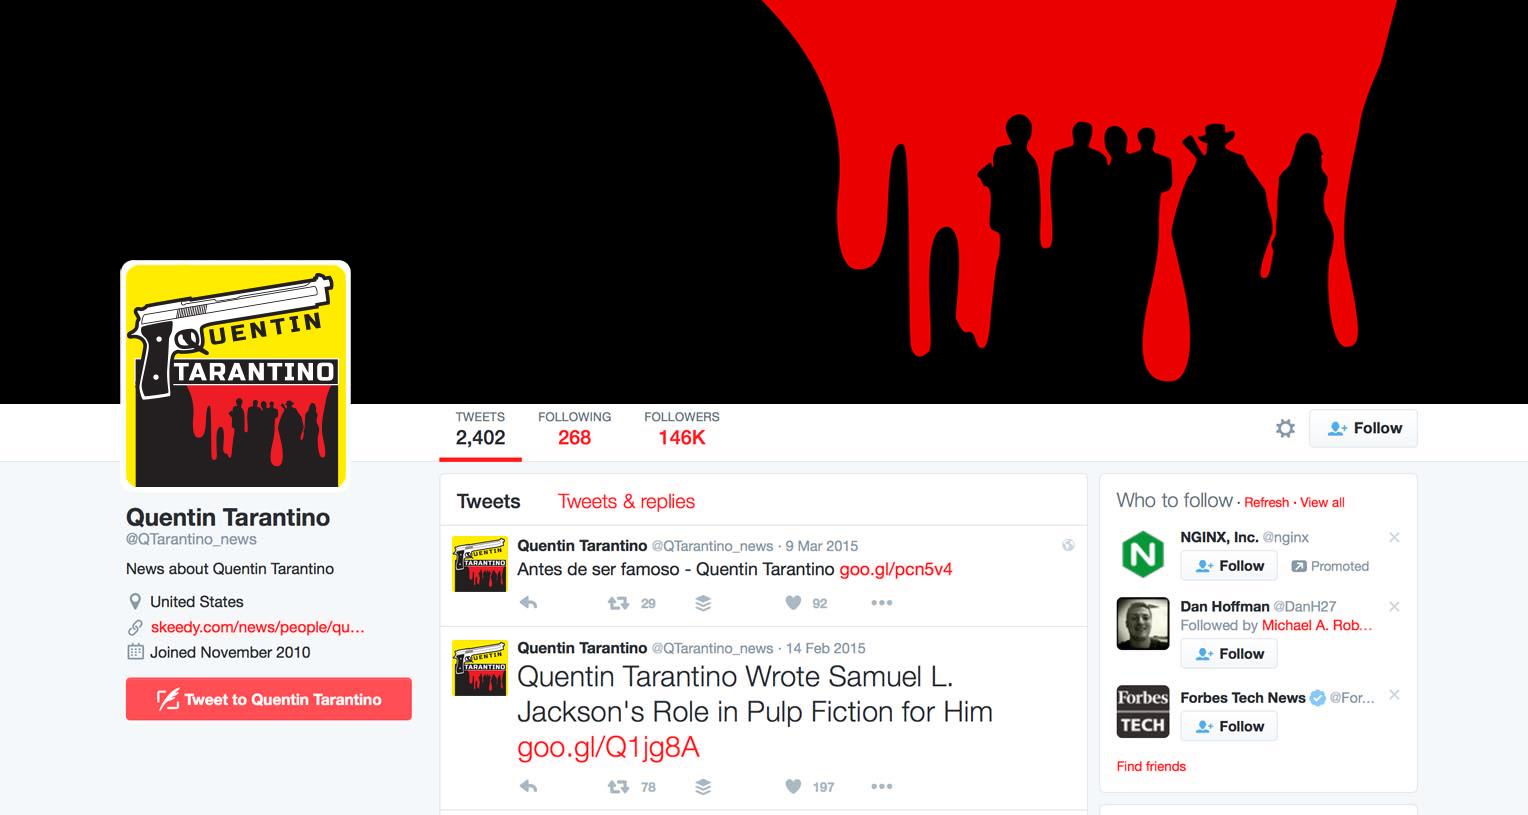 twitter profile template jake junkie2 your creative junkie